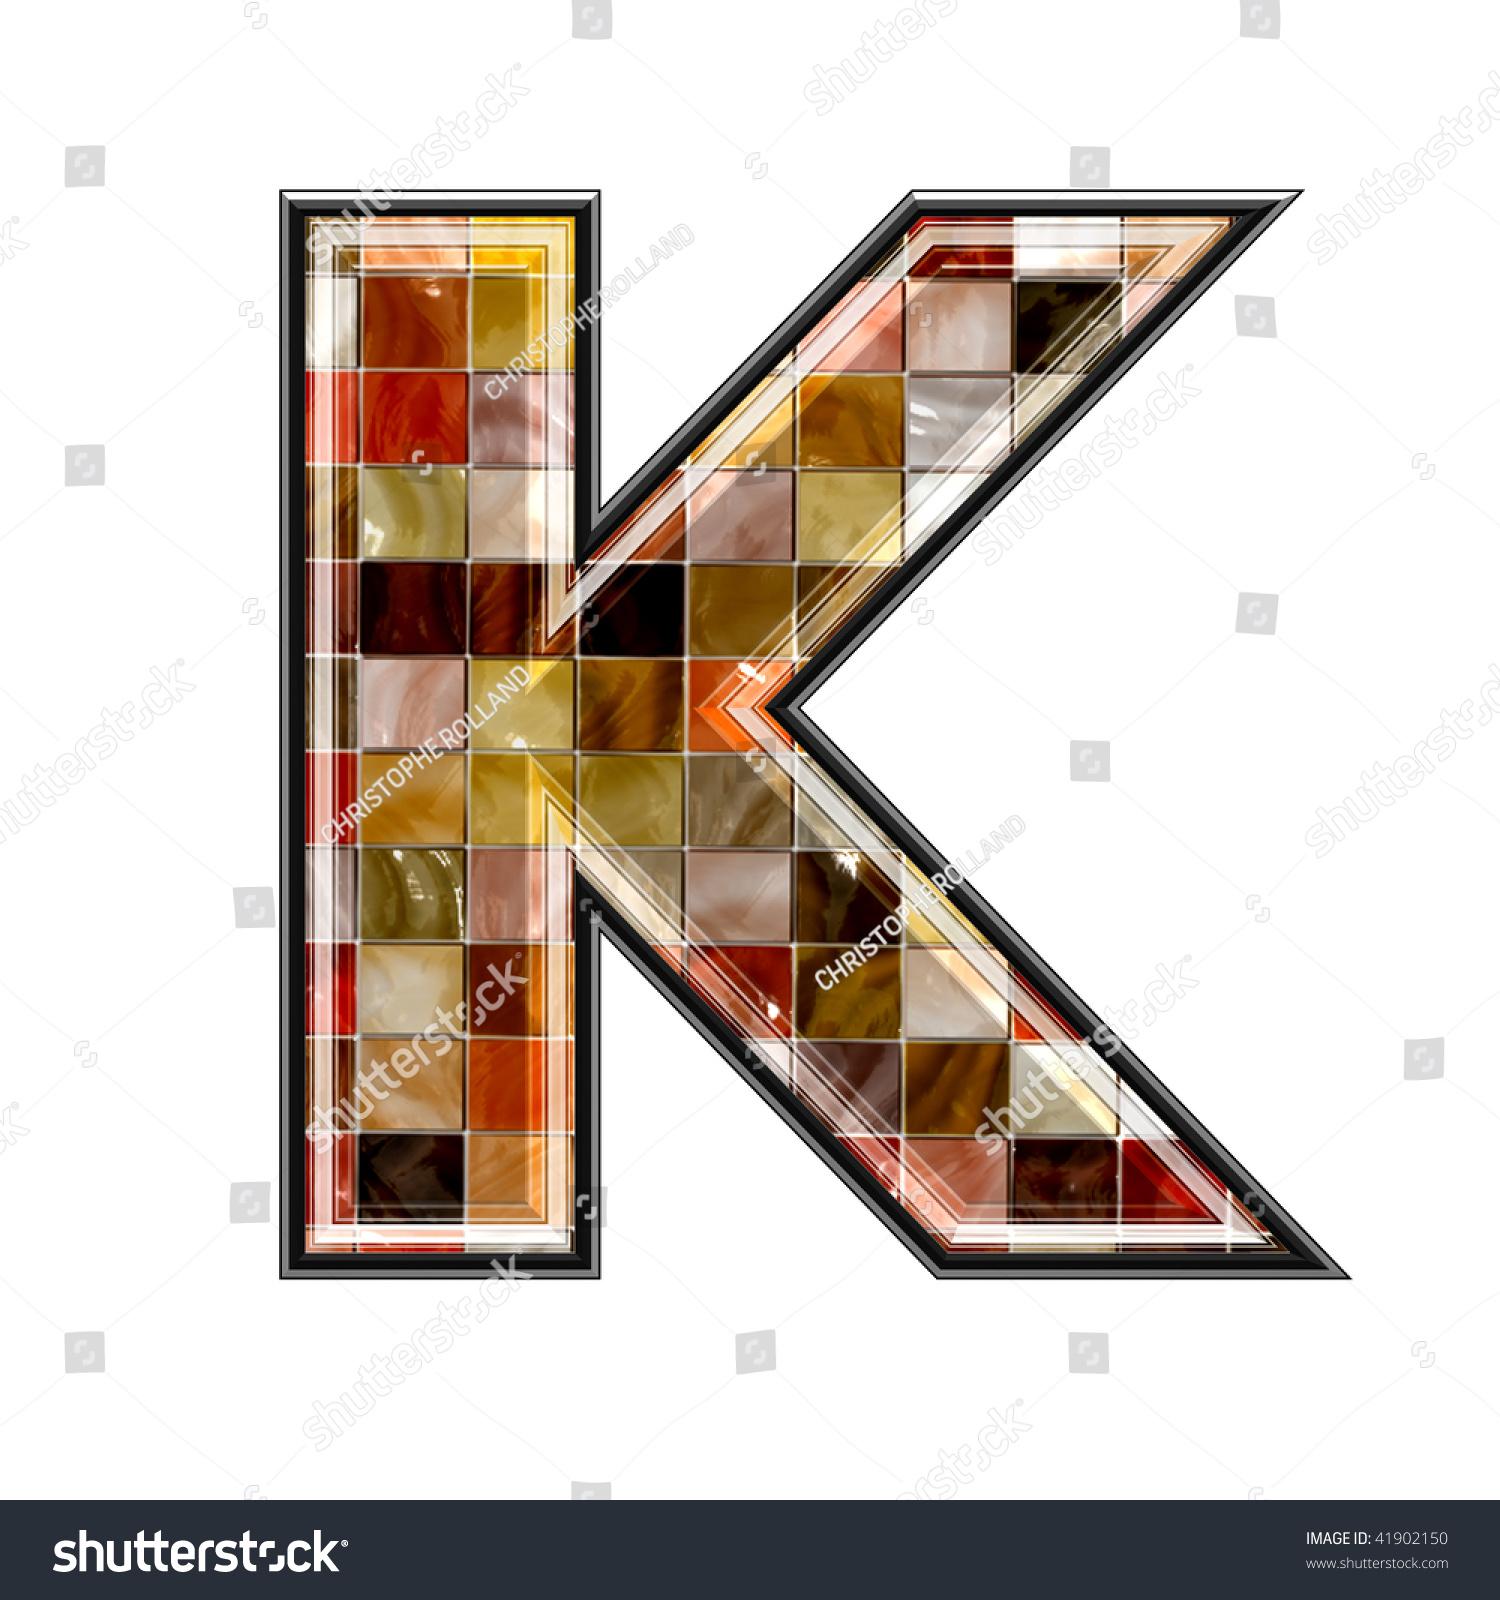 Alphabet ceramic tiles gallery tile flooring design ideas ceramic tile letters gallery tile flooring design ideas alphabet ceramic tiles image collections tile flooring design doublecrazyfo Gallery